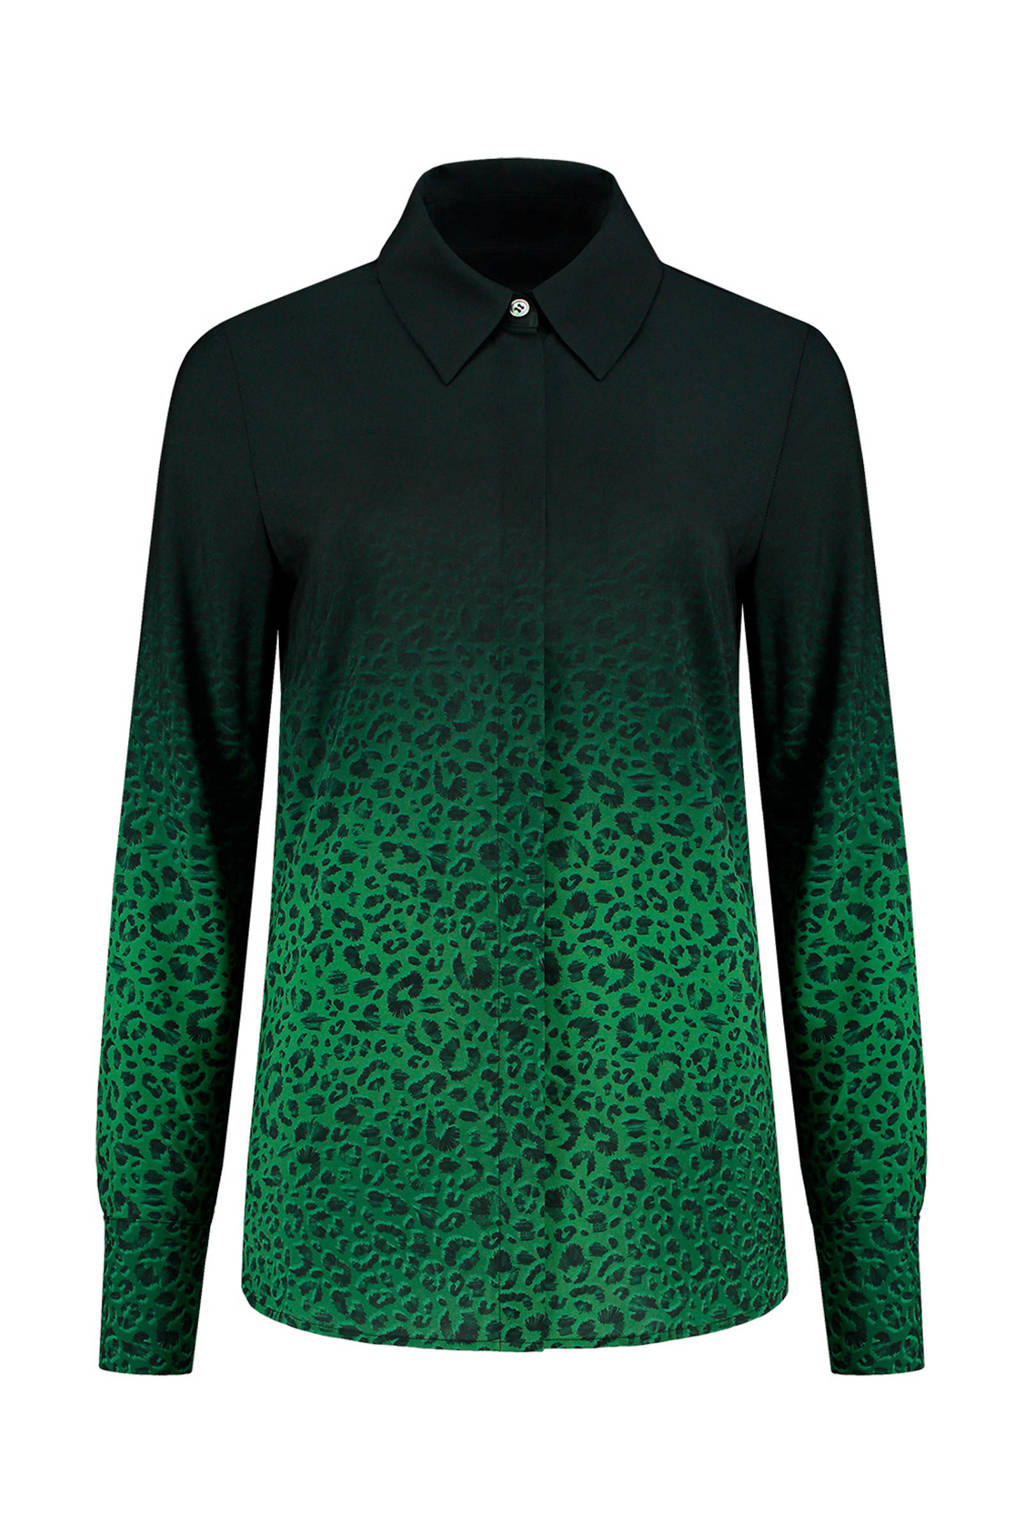 c34f3f4eae8 blouse met panterprint groen/zwart